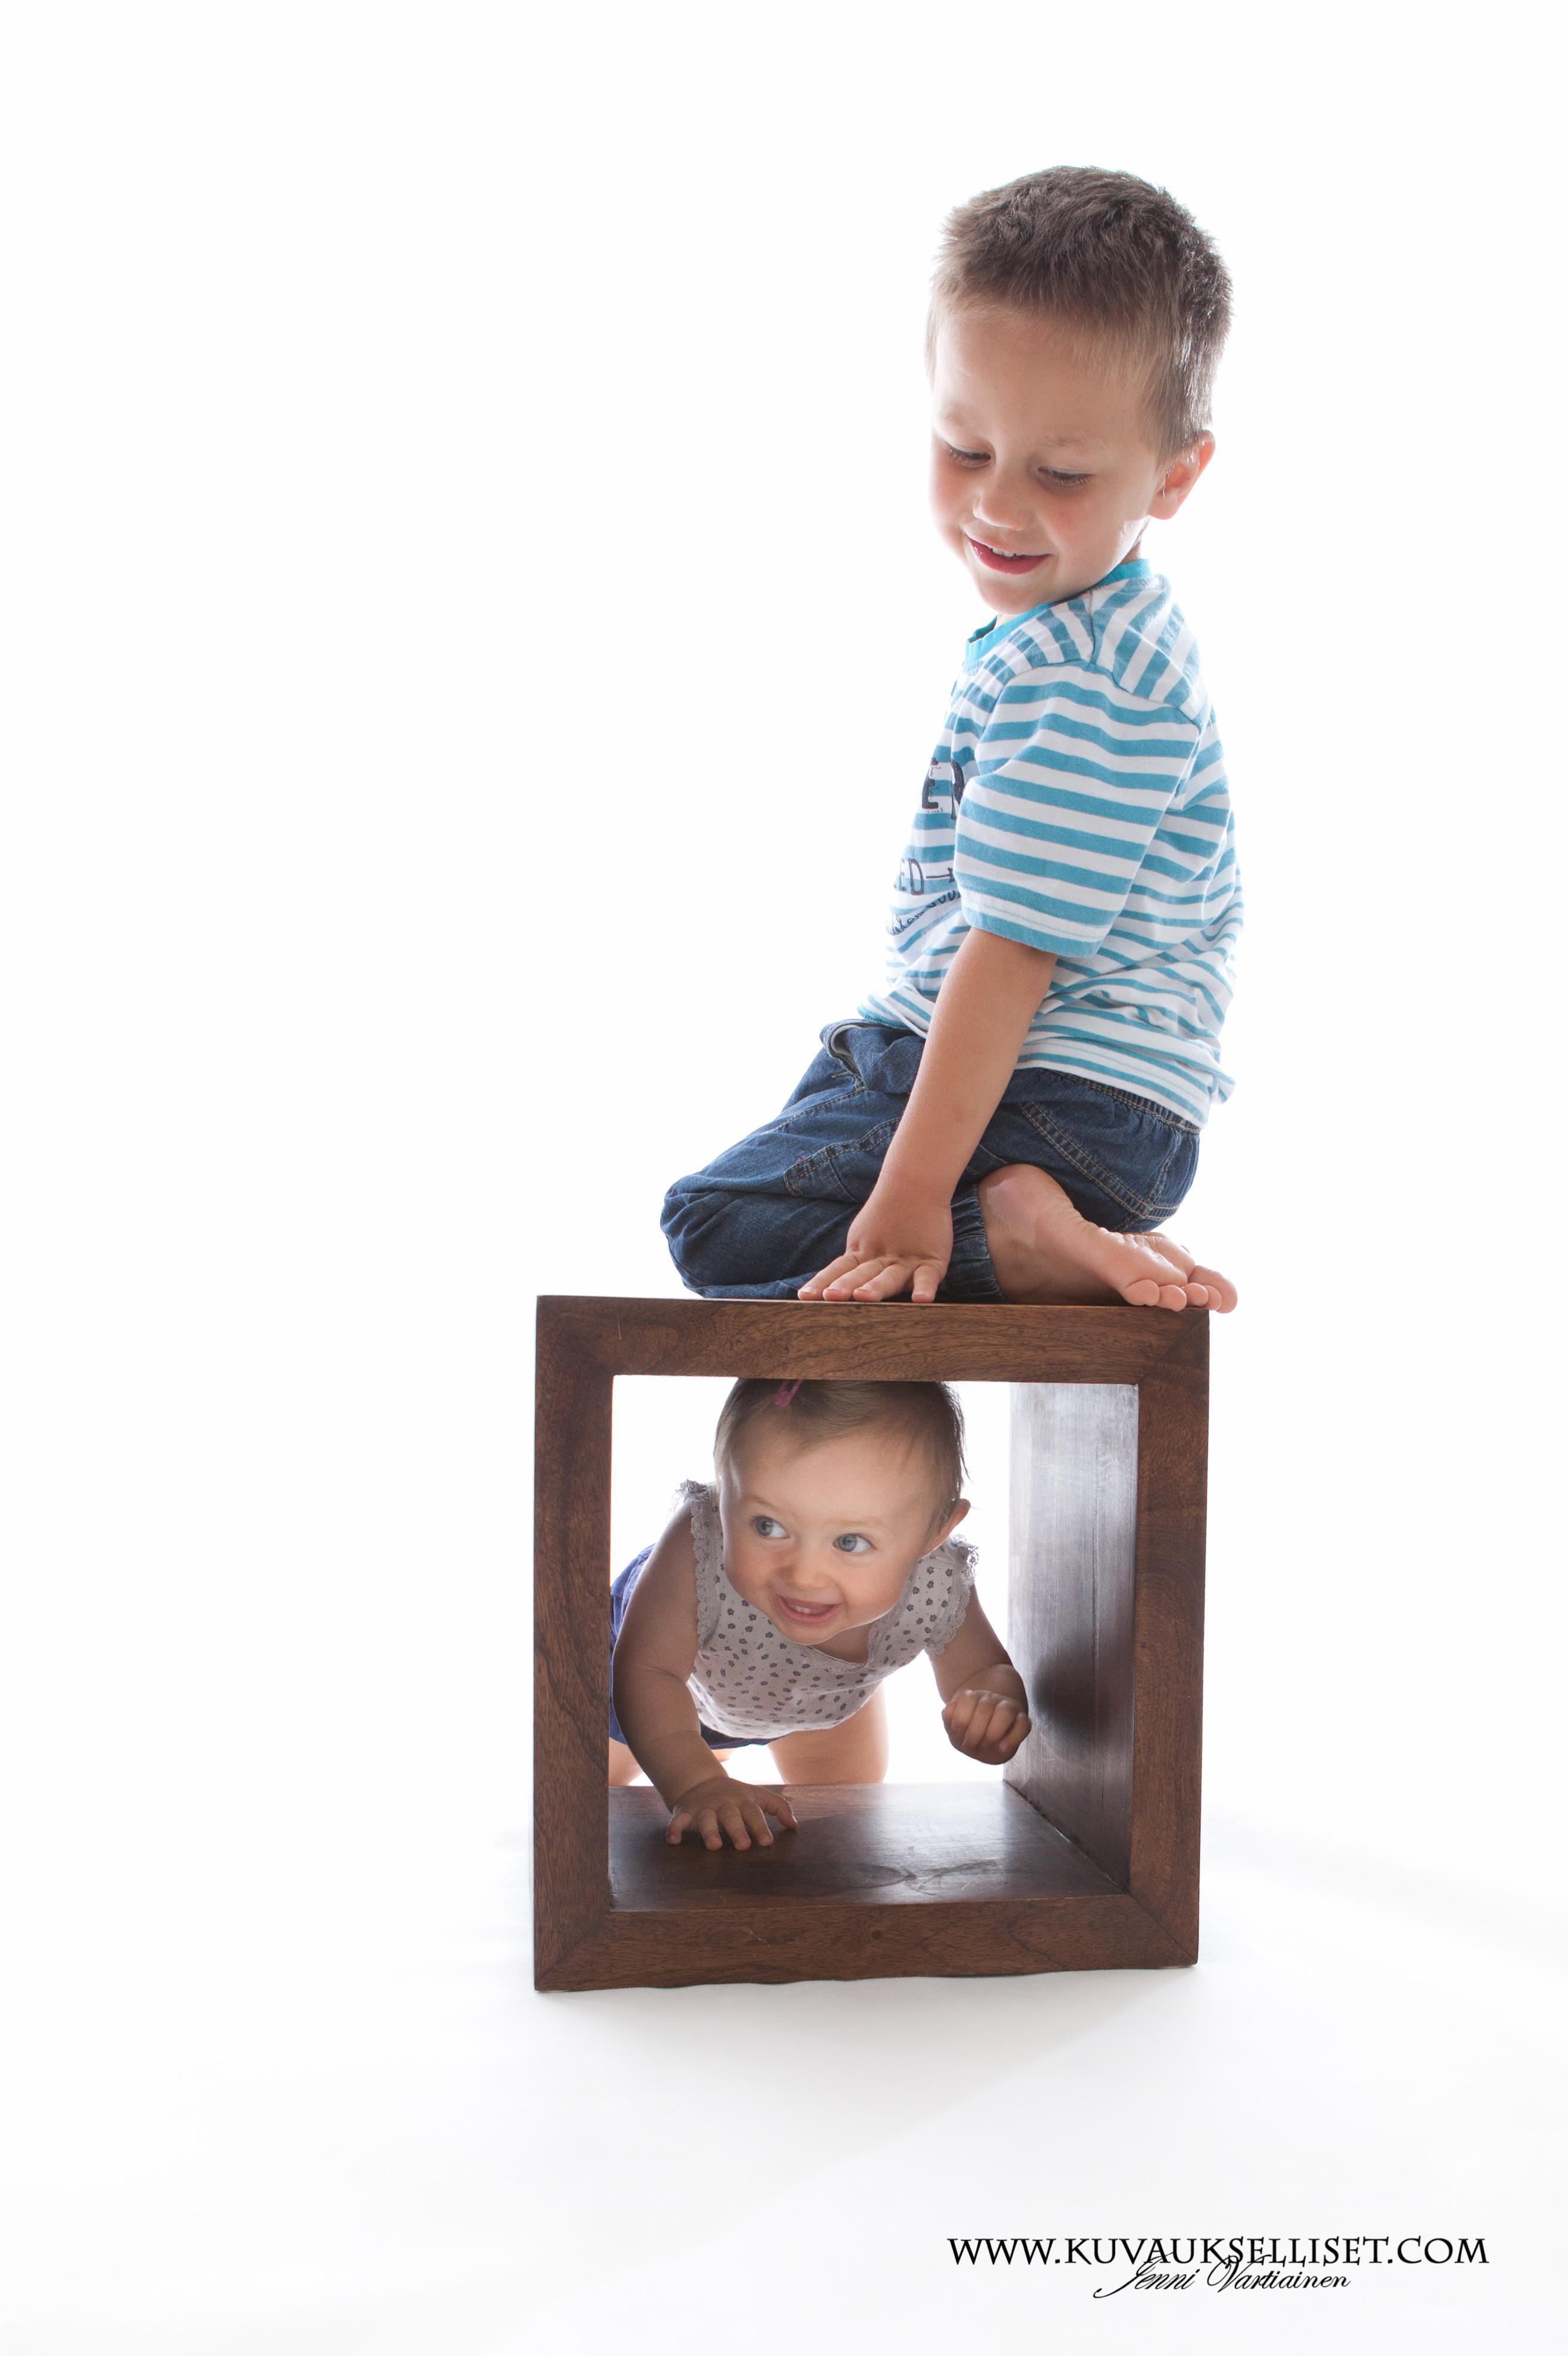 2014.8.13 lapsikuvaus miljöökuvaus perhekuvaus 1-vuotiskuvaus family pictures child photo(3 of 6)